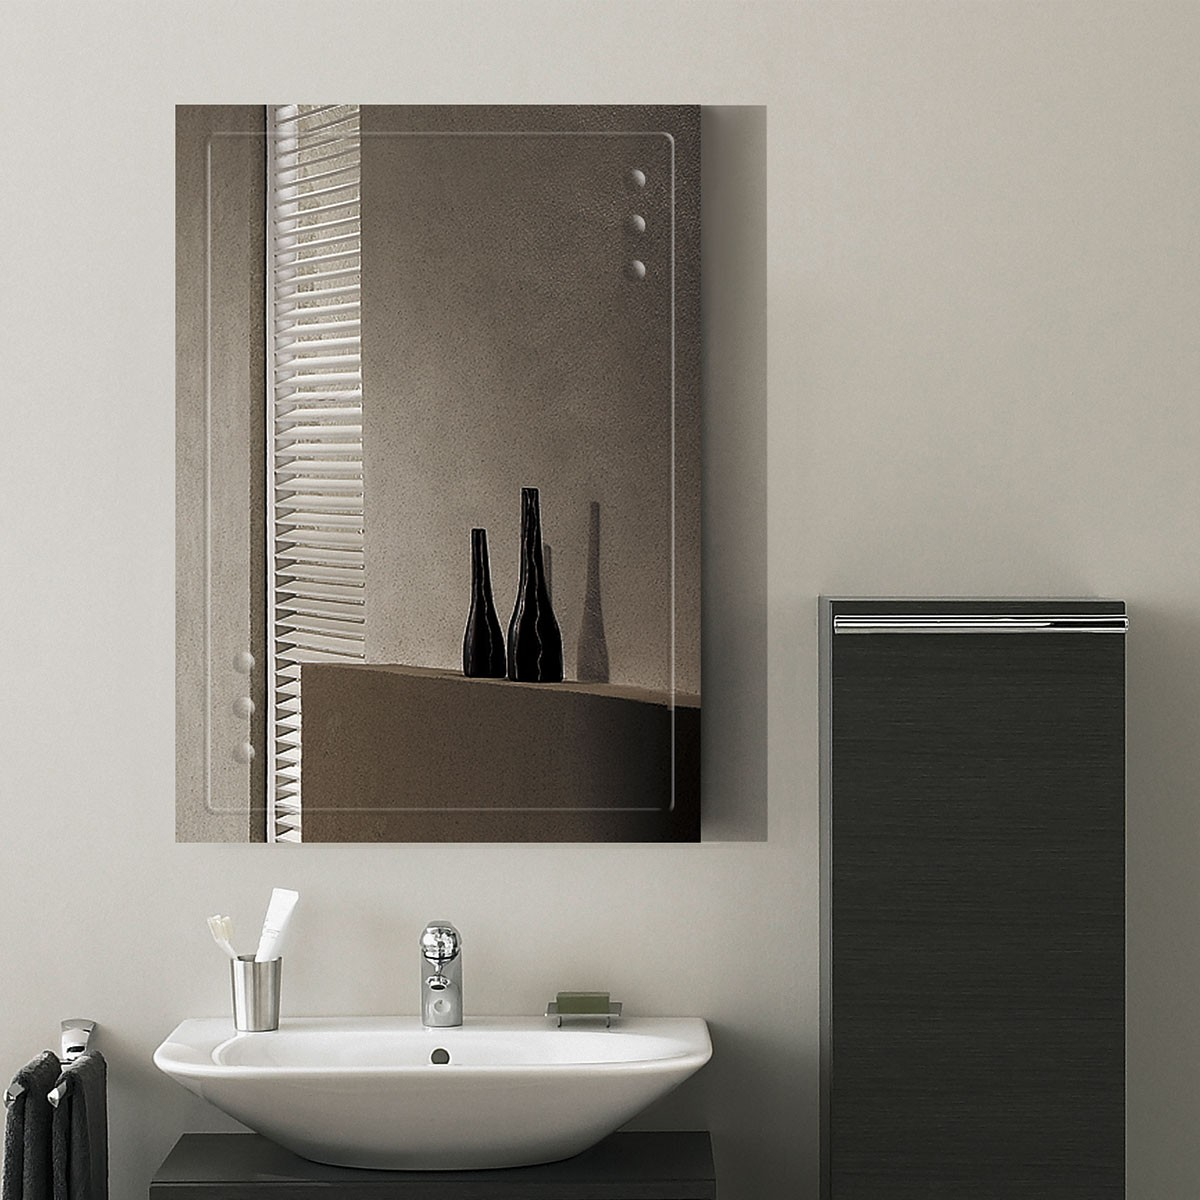 28 x 20 po miroir mural salle de bain classique rectangulaire sans cadre accrochage vertical - Miroir Mural Salle De Bain